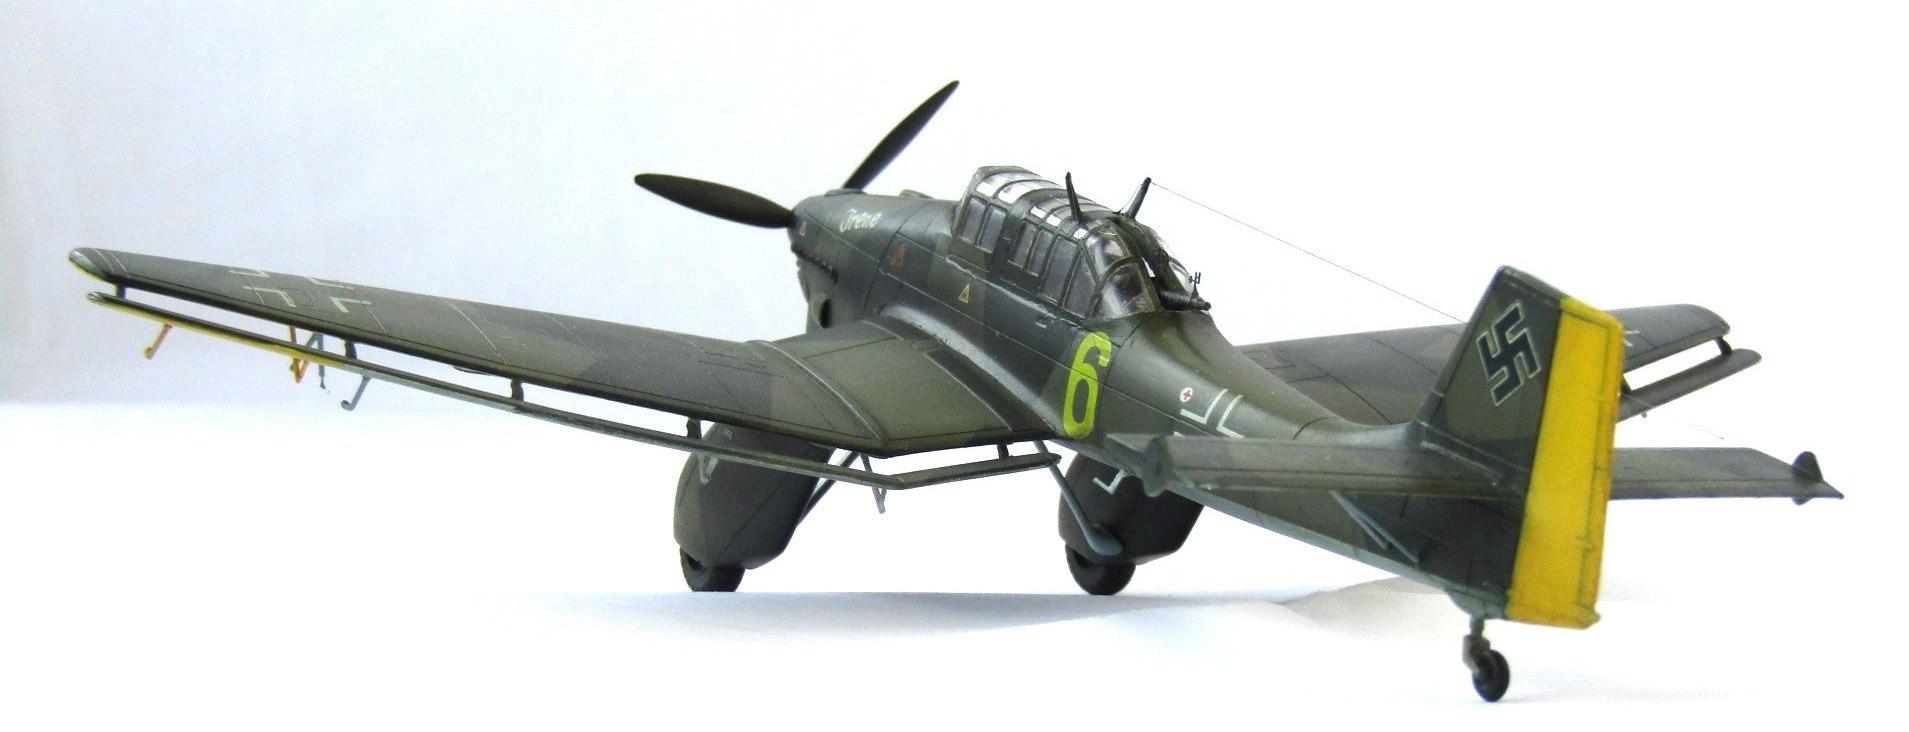 Ju-87A 1/72 (Special Hobby) TM4Si0DiBeg